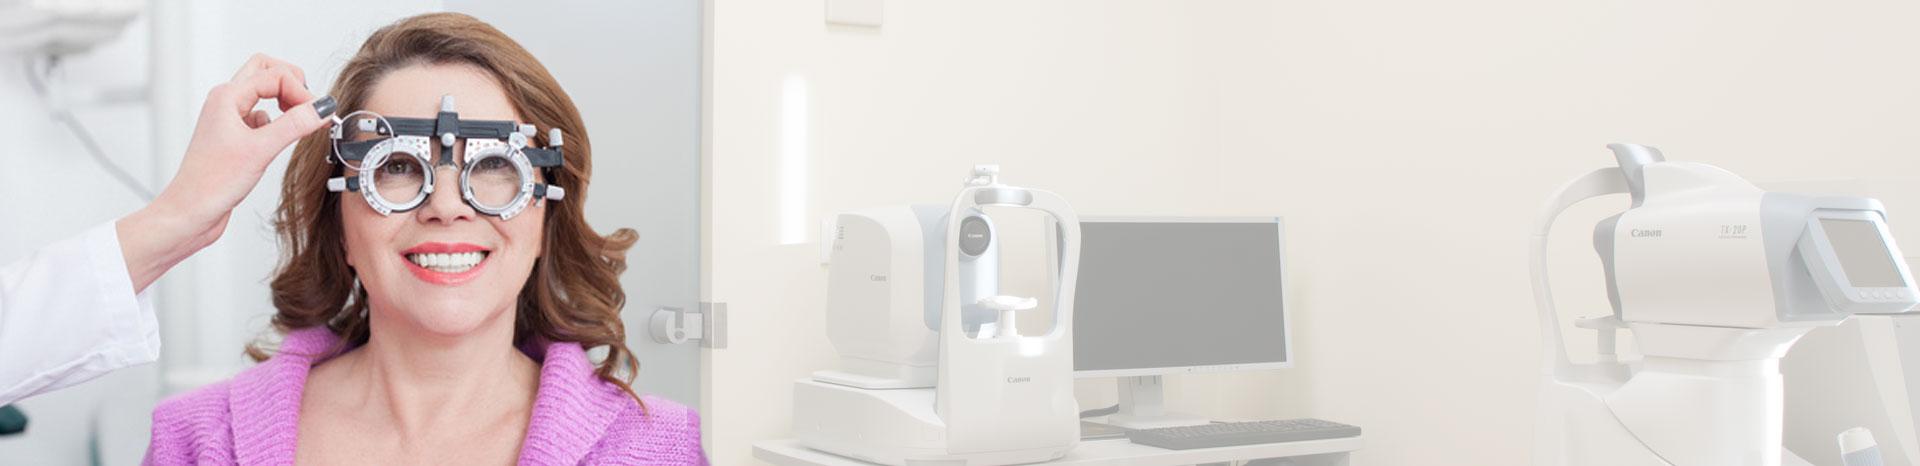 Slider image 0